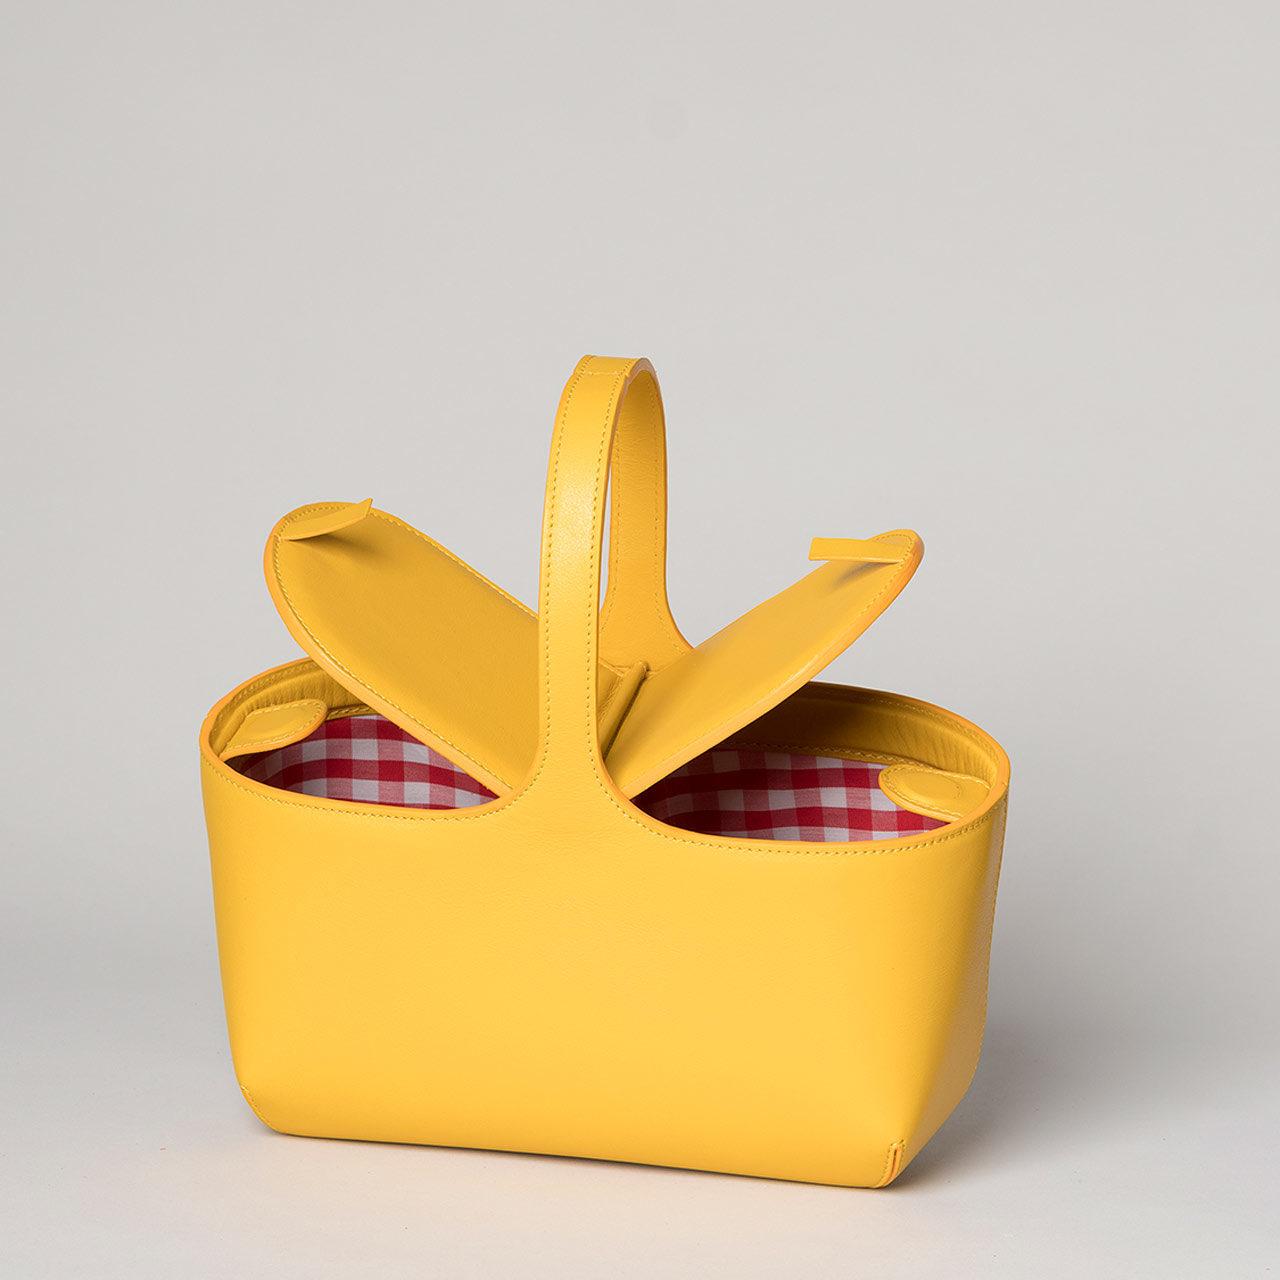 sac pique-nique Estebanot cuir nappa jaune